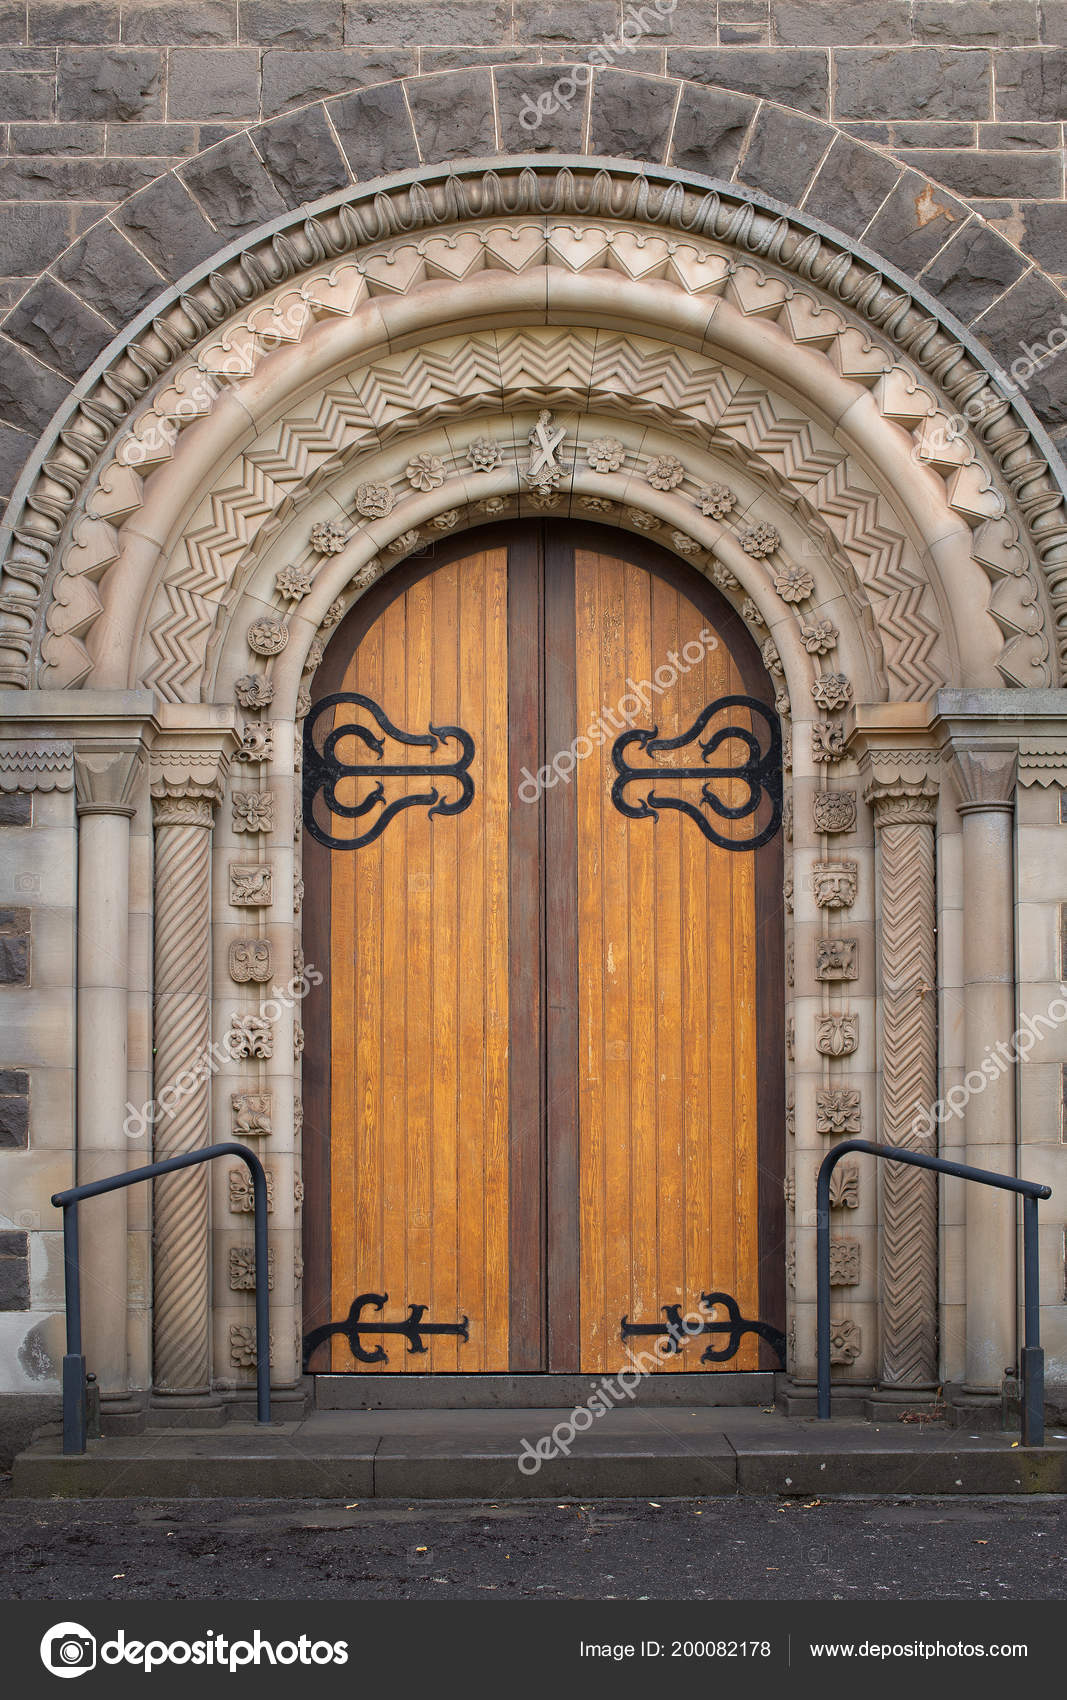 View Large Timber Doors Entrance Andrews Uniting Church Ballarat Victoria u2014 Stock Photo & View Large Timber Doors Entrance Andrews Uniting Church Ballarat ...